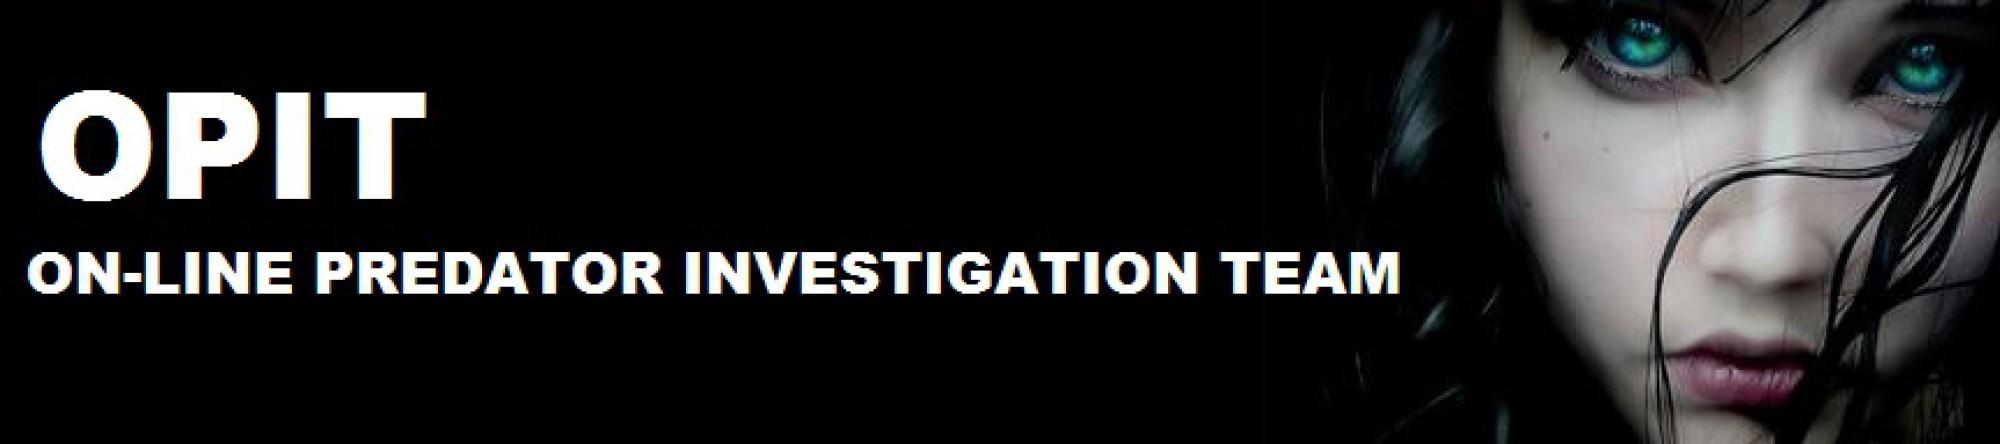 On-Line Predator Investigation Team catching groomers on Facebook.